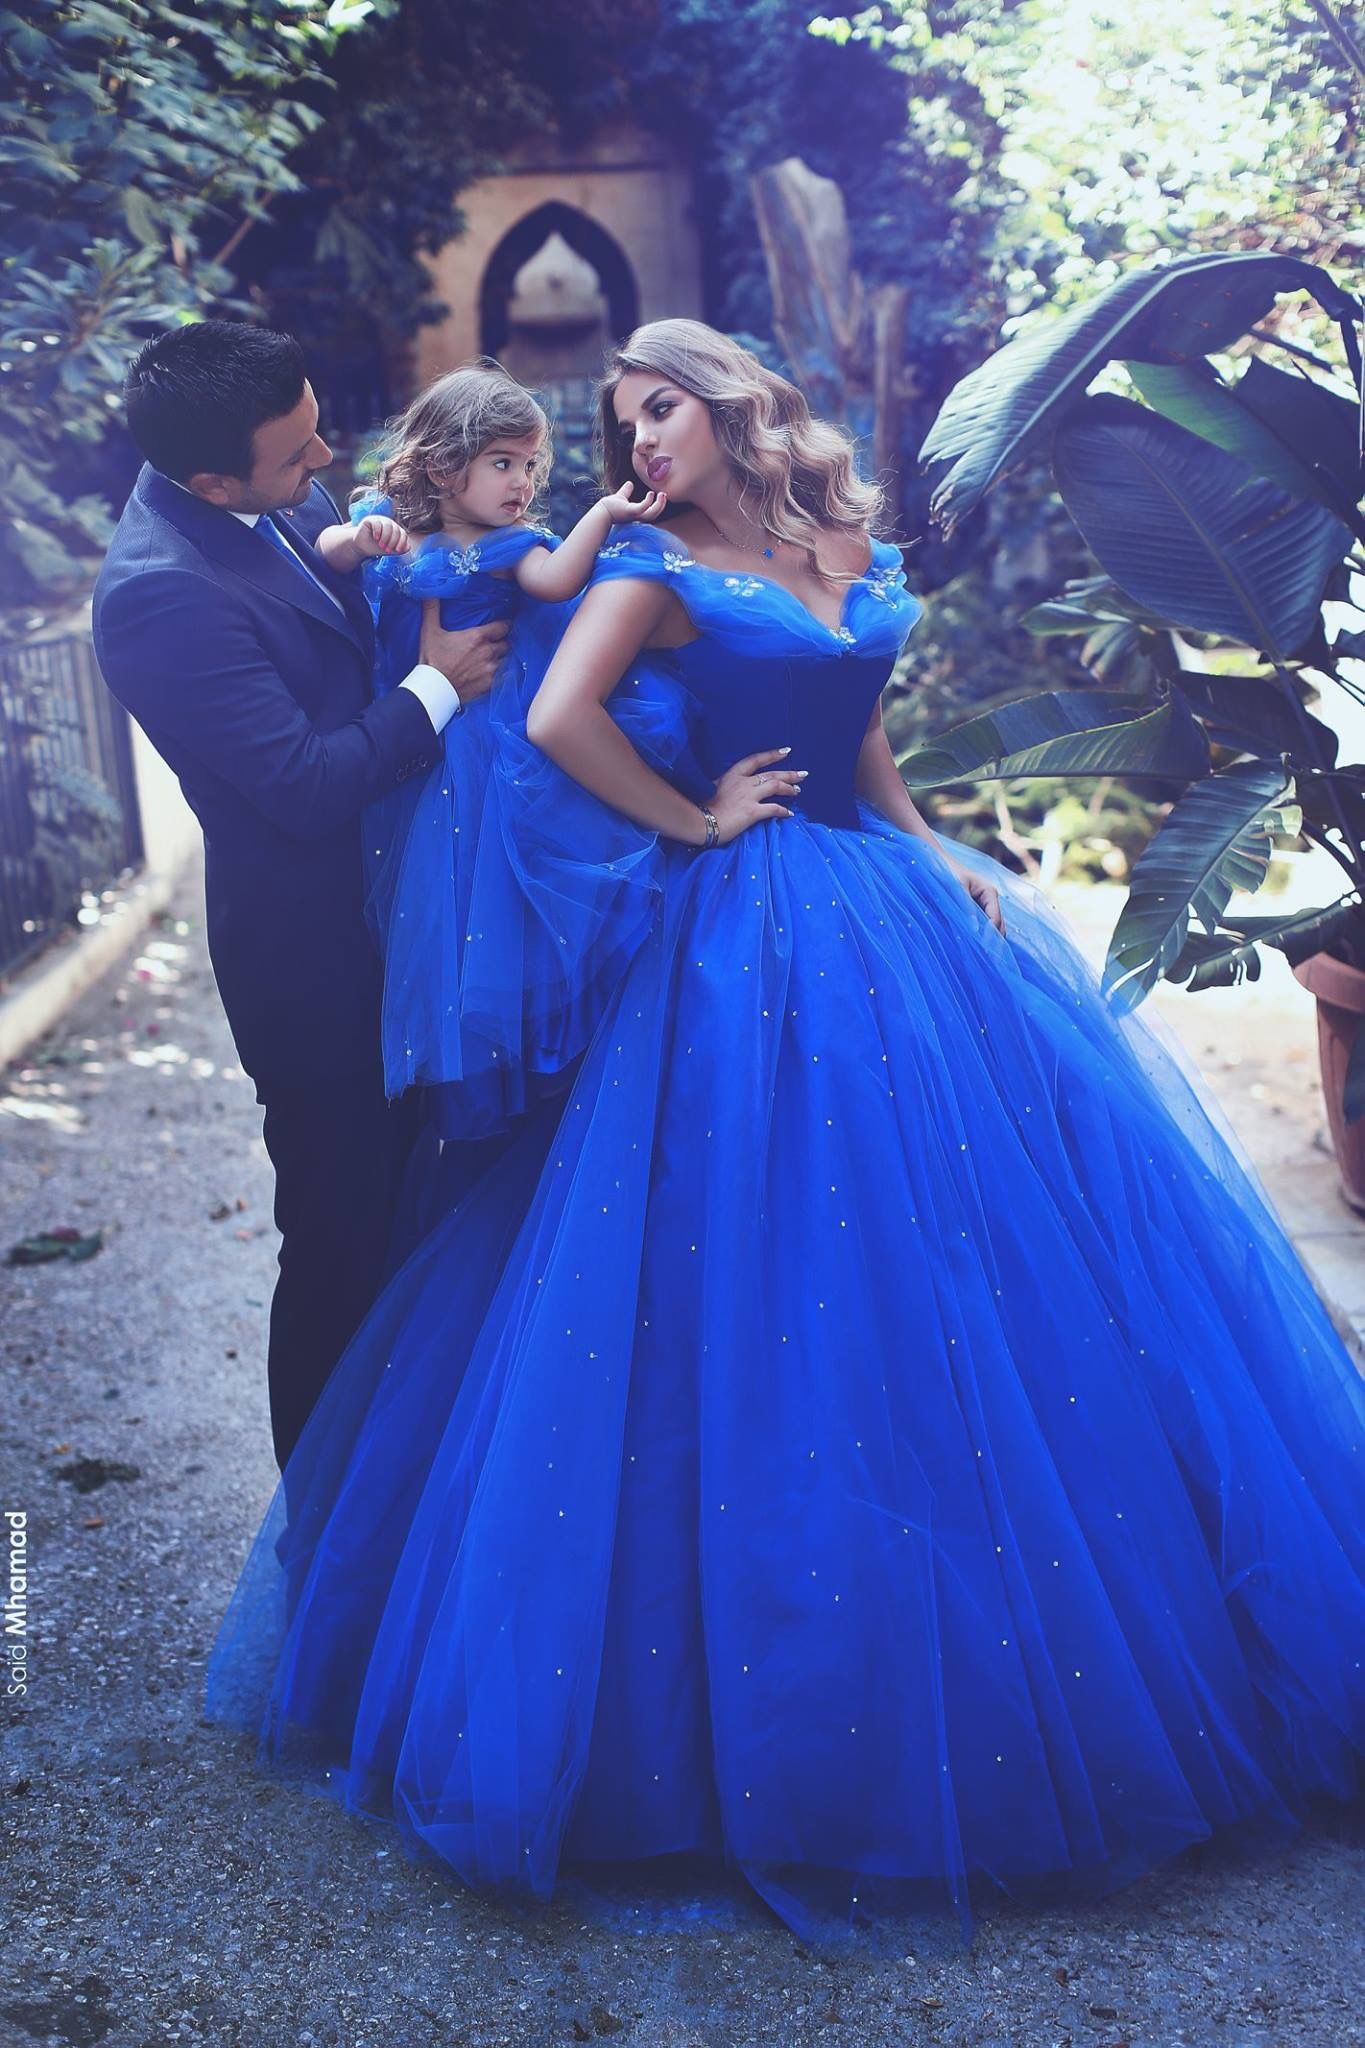 Pinterest Terranmikaela ‧⁺ ᵒ̴̶̷̥́ 183 ̫ ᵒ̴̶̷̣̥̀ ‧₊˚ Robe Cendrillon Robe De Bouqueti 232 Re Robe Fantaisie